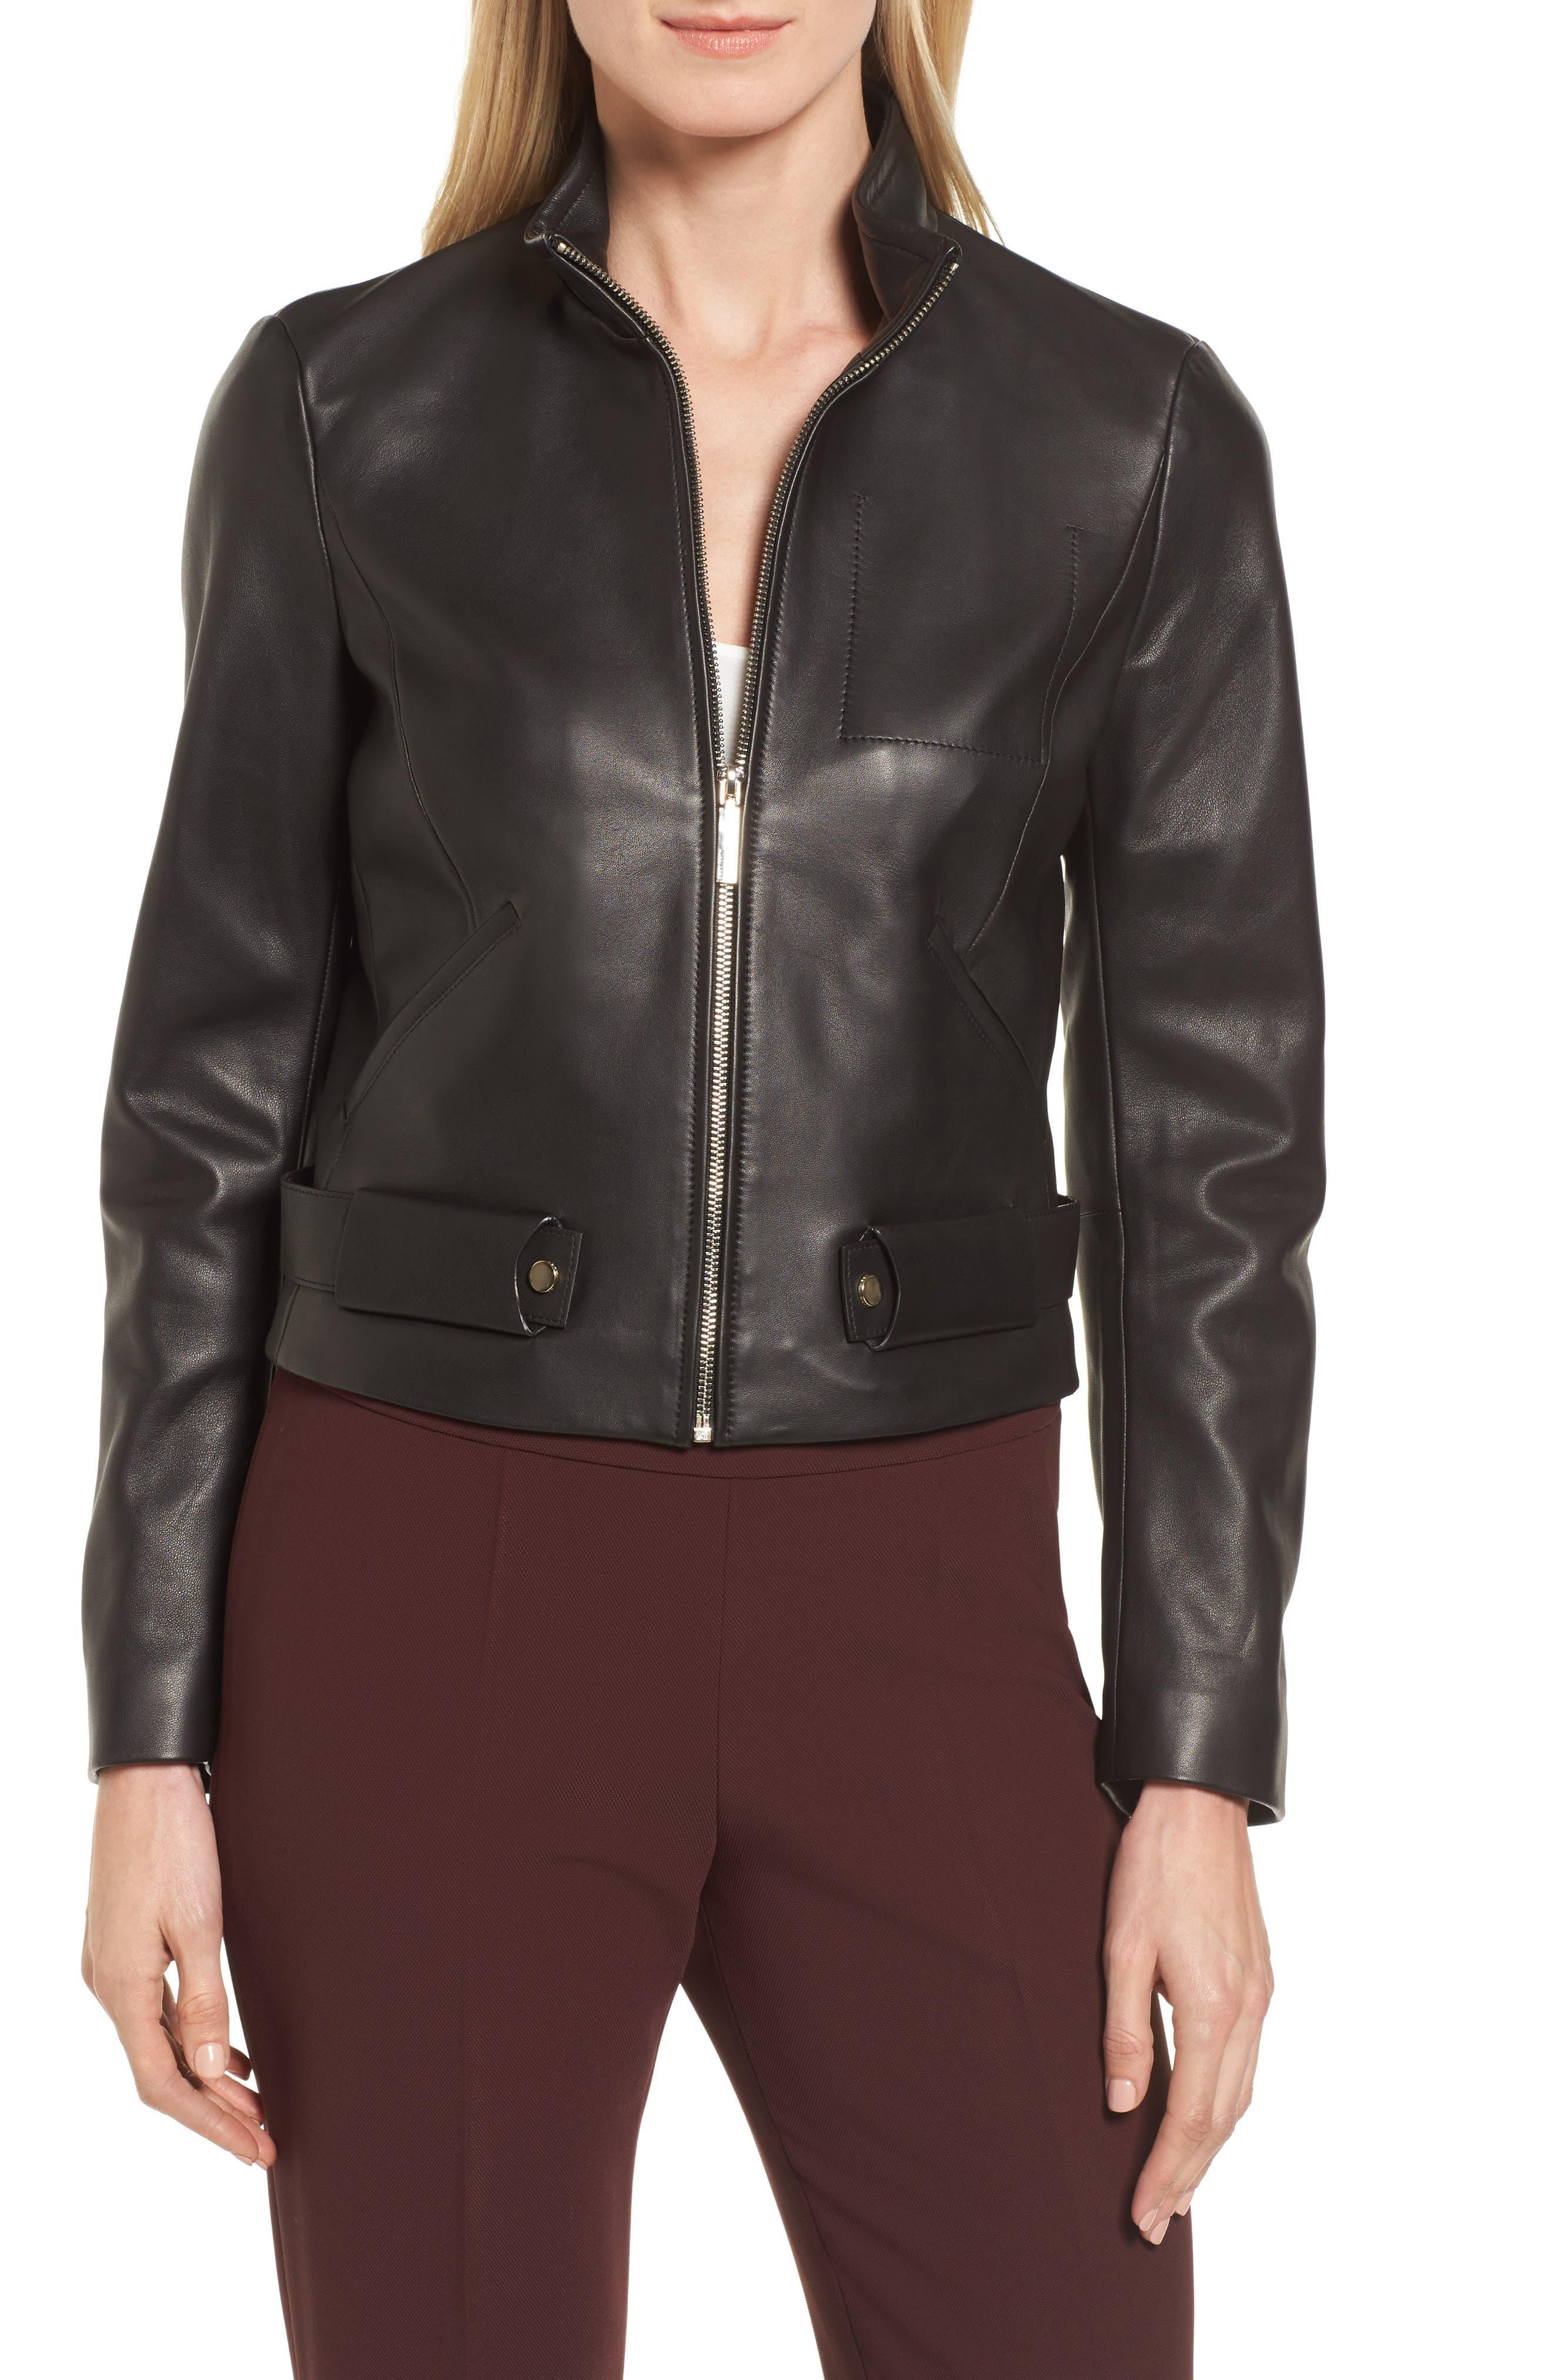 Sanuvo Leather Jacket,                         Main,                         color, Black